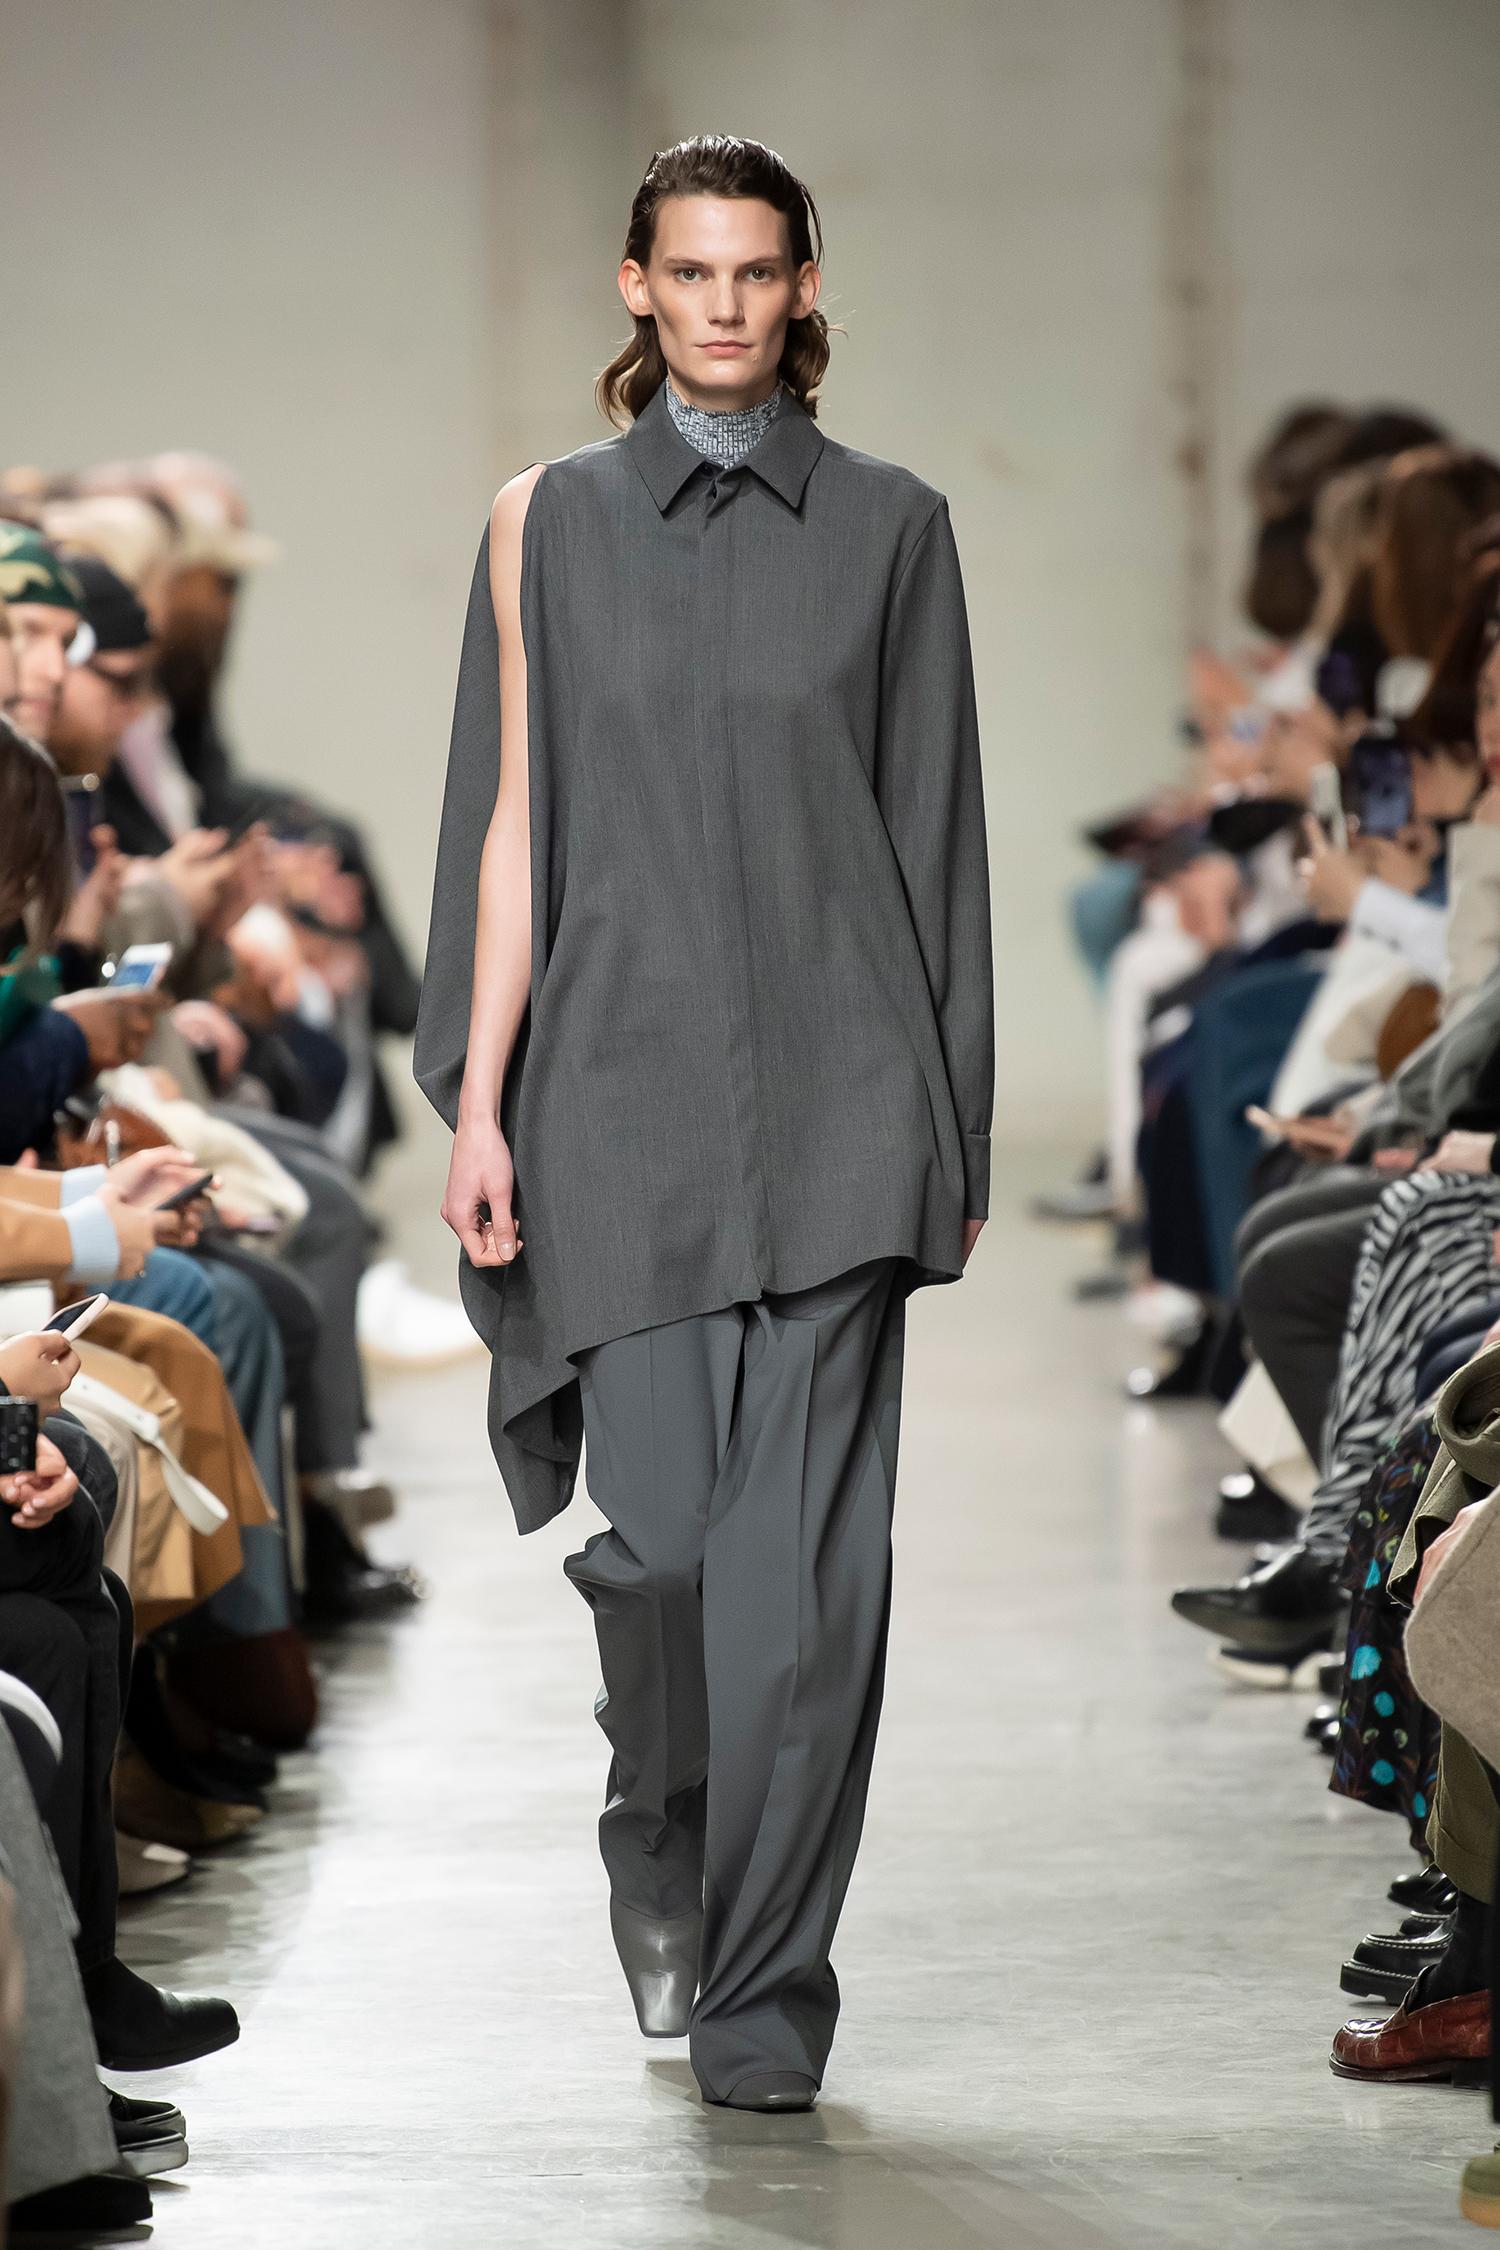 LOOK 33 Shirt RIESA Knitwear RISLA Trousers RILLA